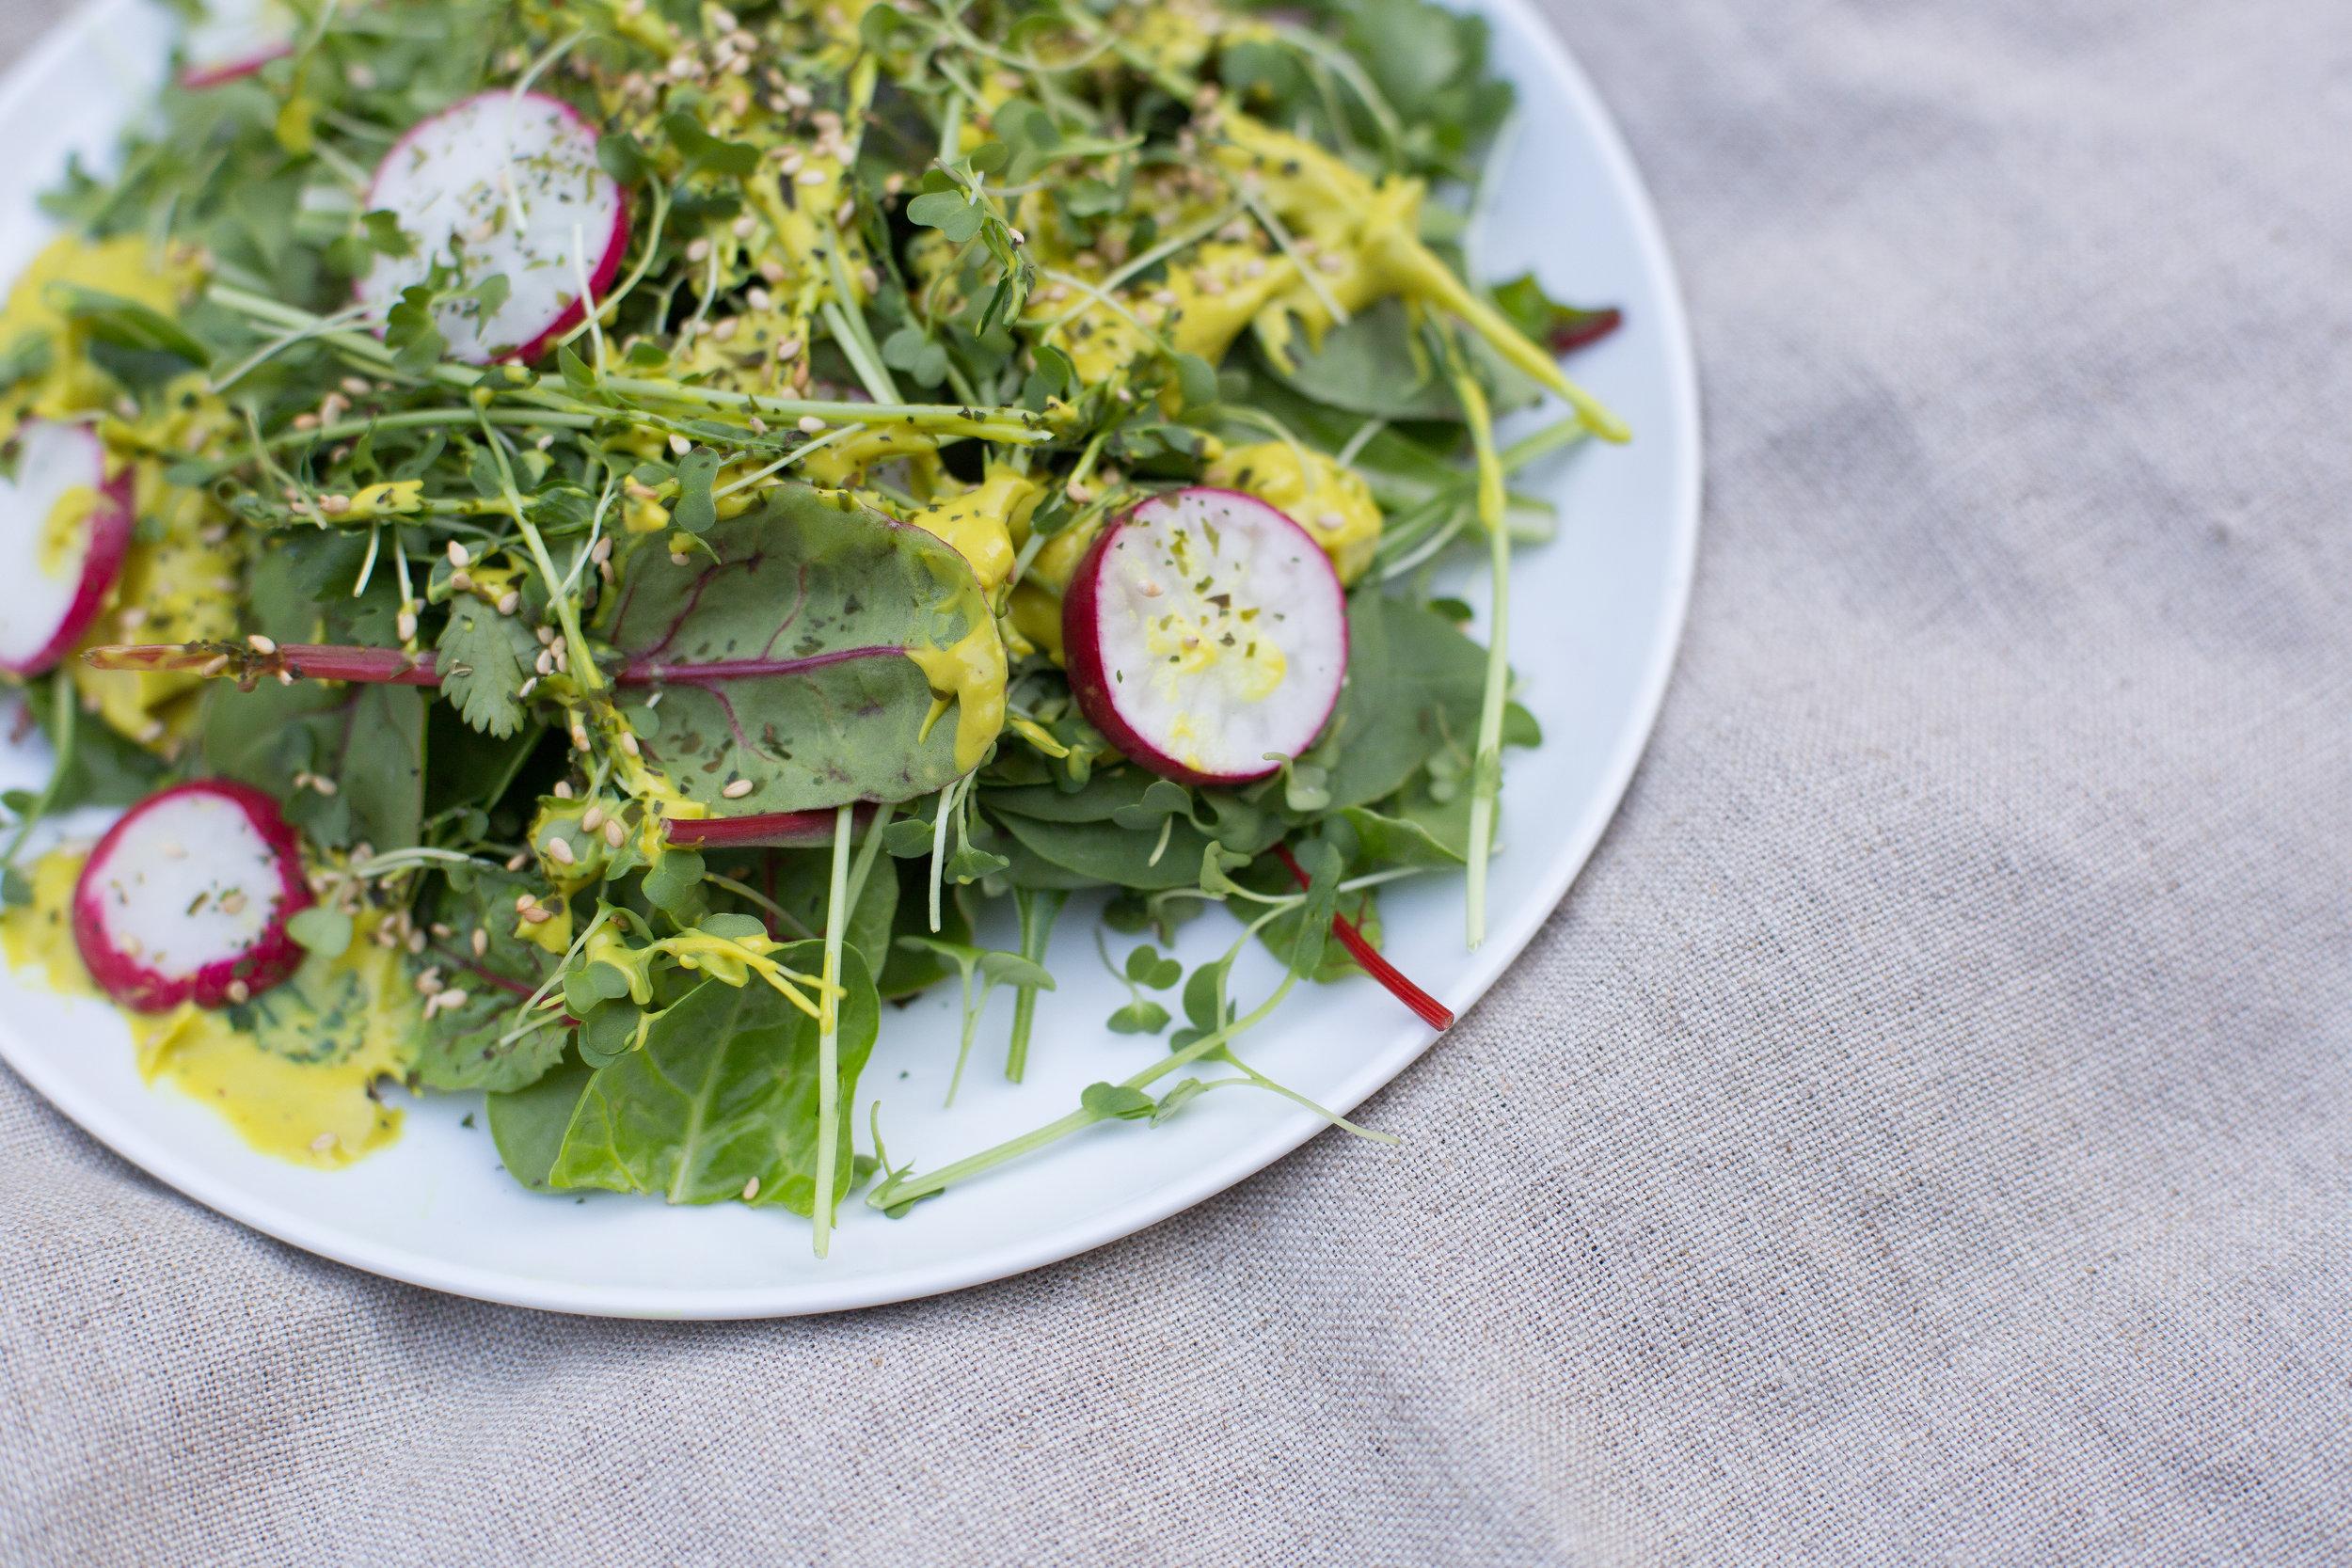 Kristin Dahl Nutrition Blog Mixed Baby Kale Salad With Creamy Turmeric Dressing